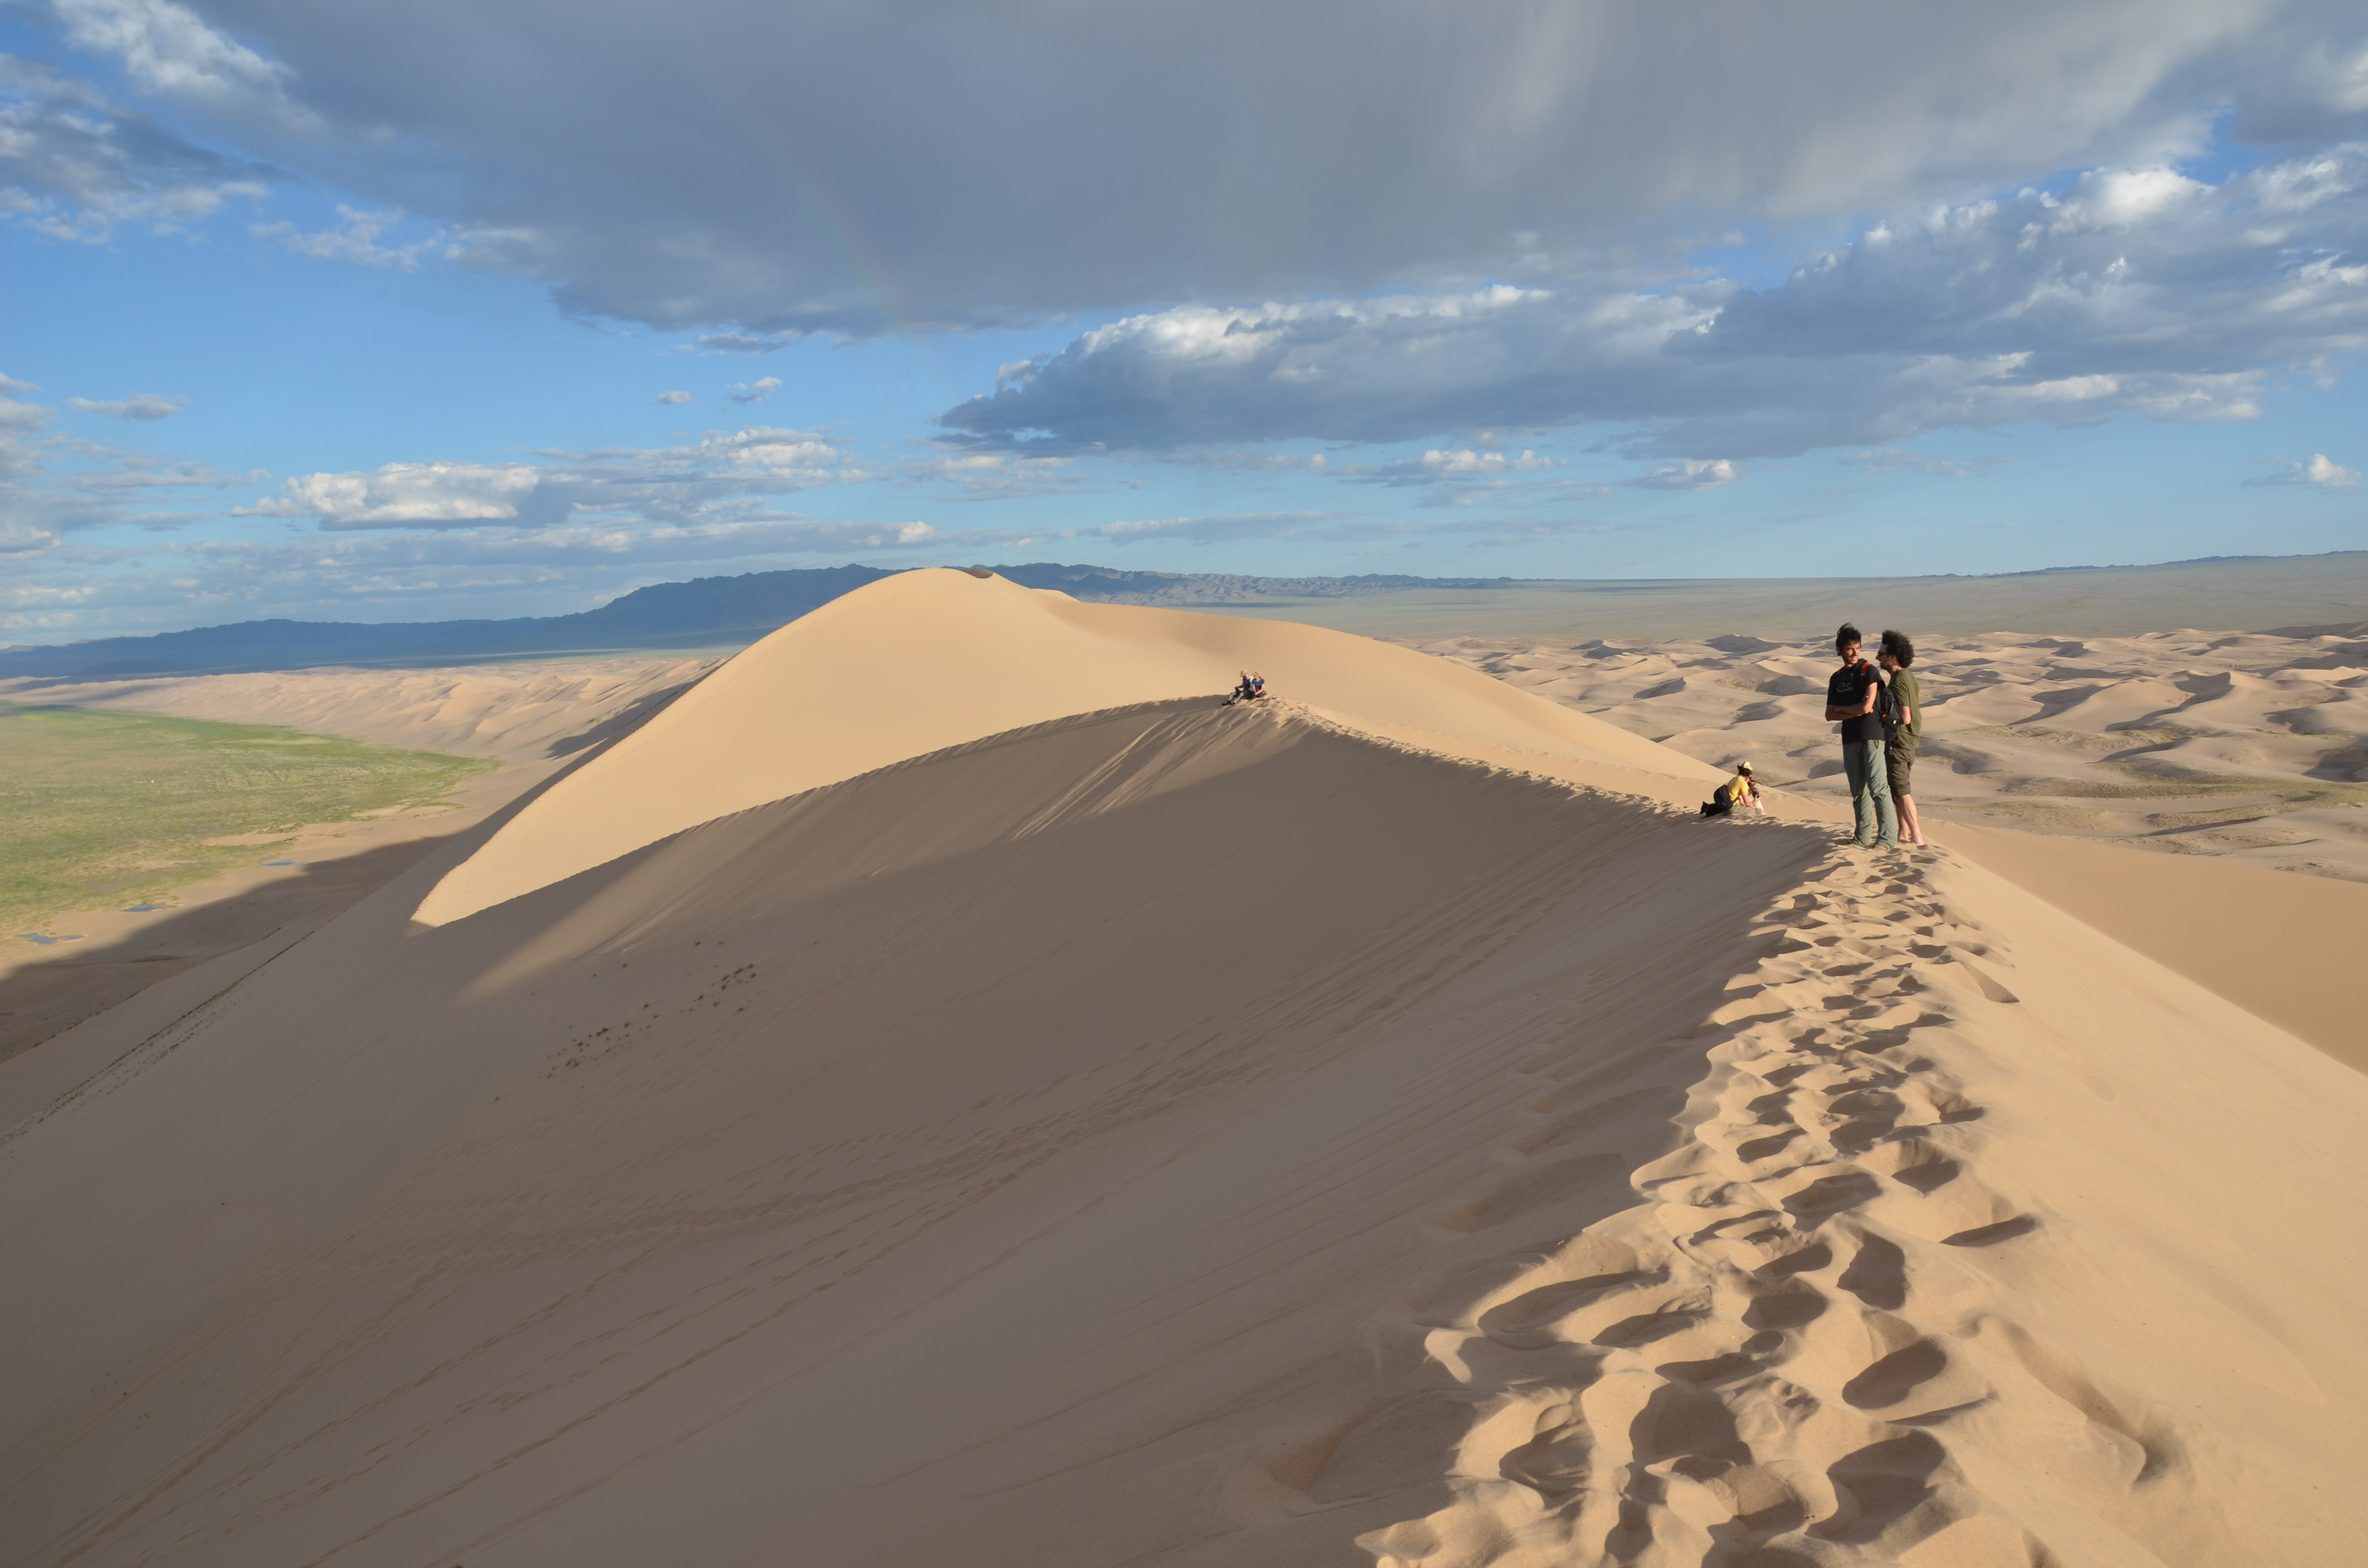 Dunes, Dinosaurs and the Flaming Cliffs: Mt  Biking the Gobi Desert